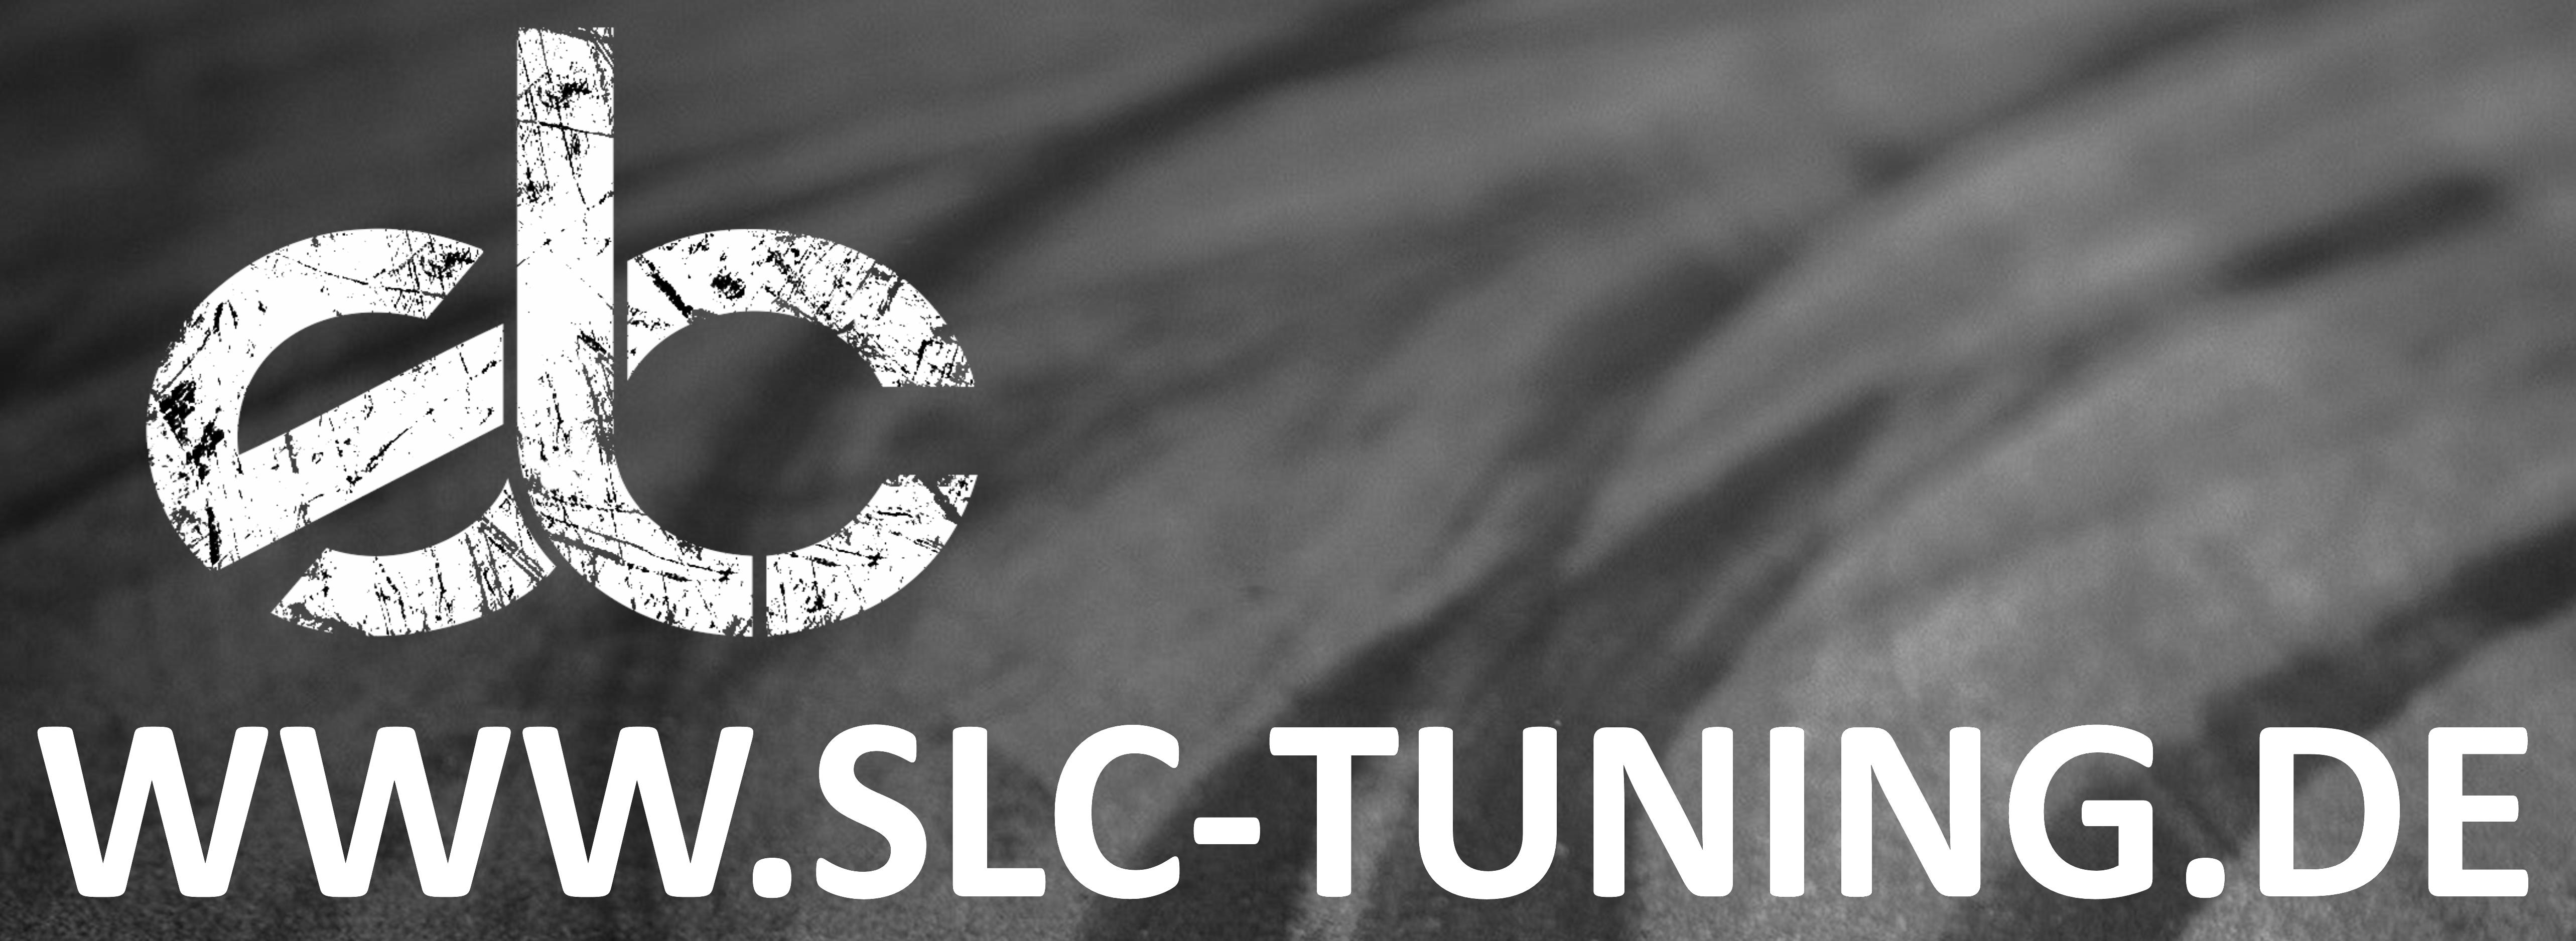 slc-tuning.de